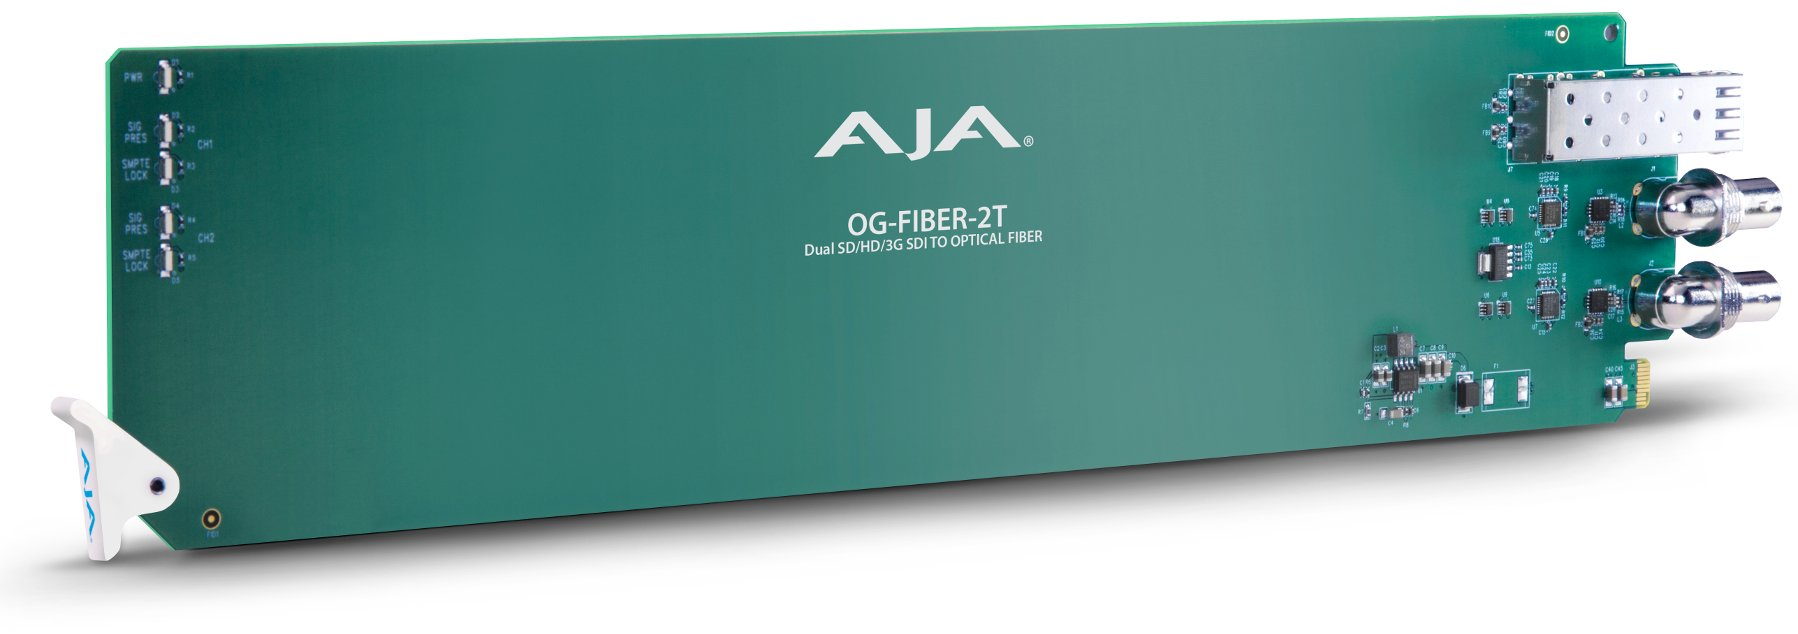 2-Channel openGear SDI to Fiber Converter